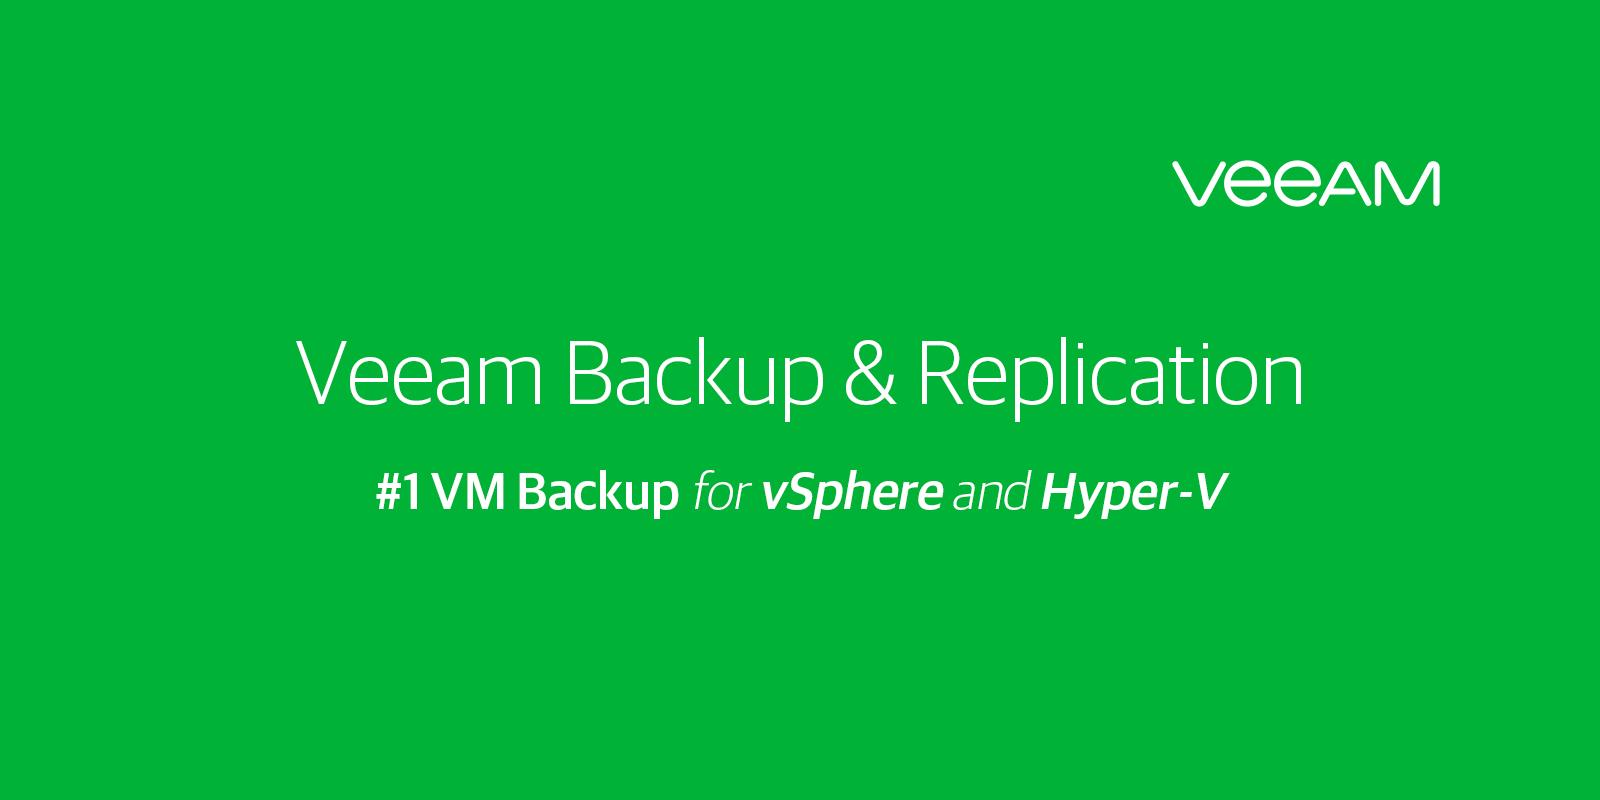 veeam_backup_replication